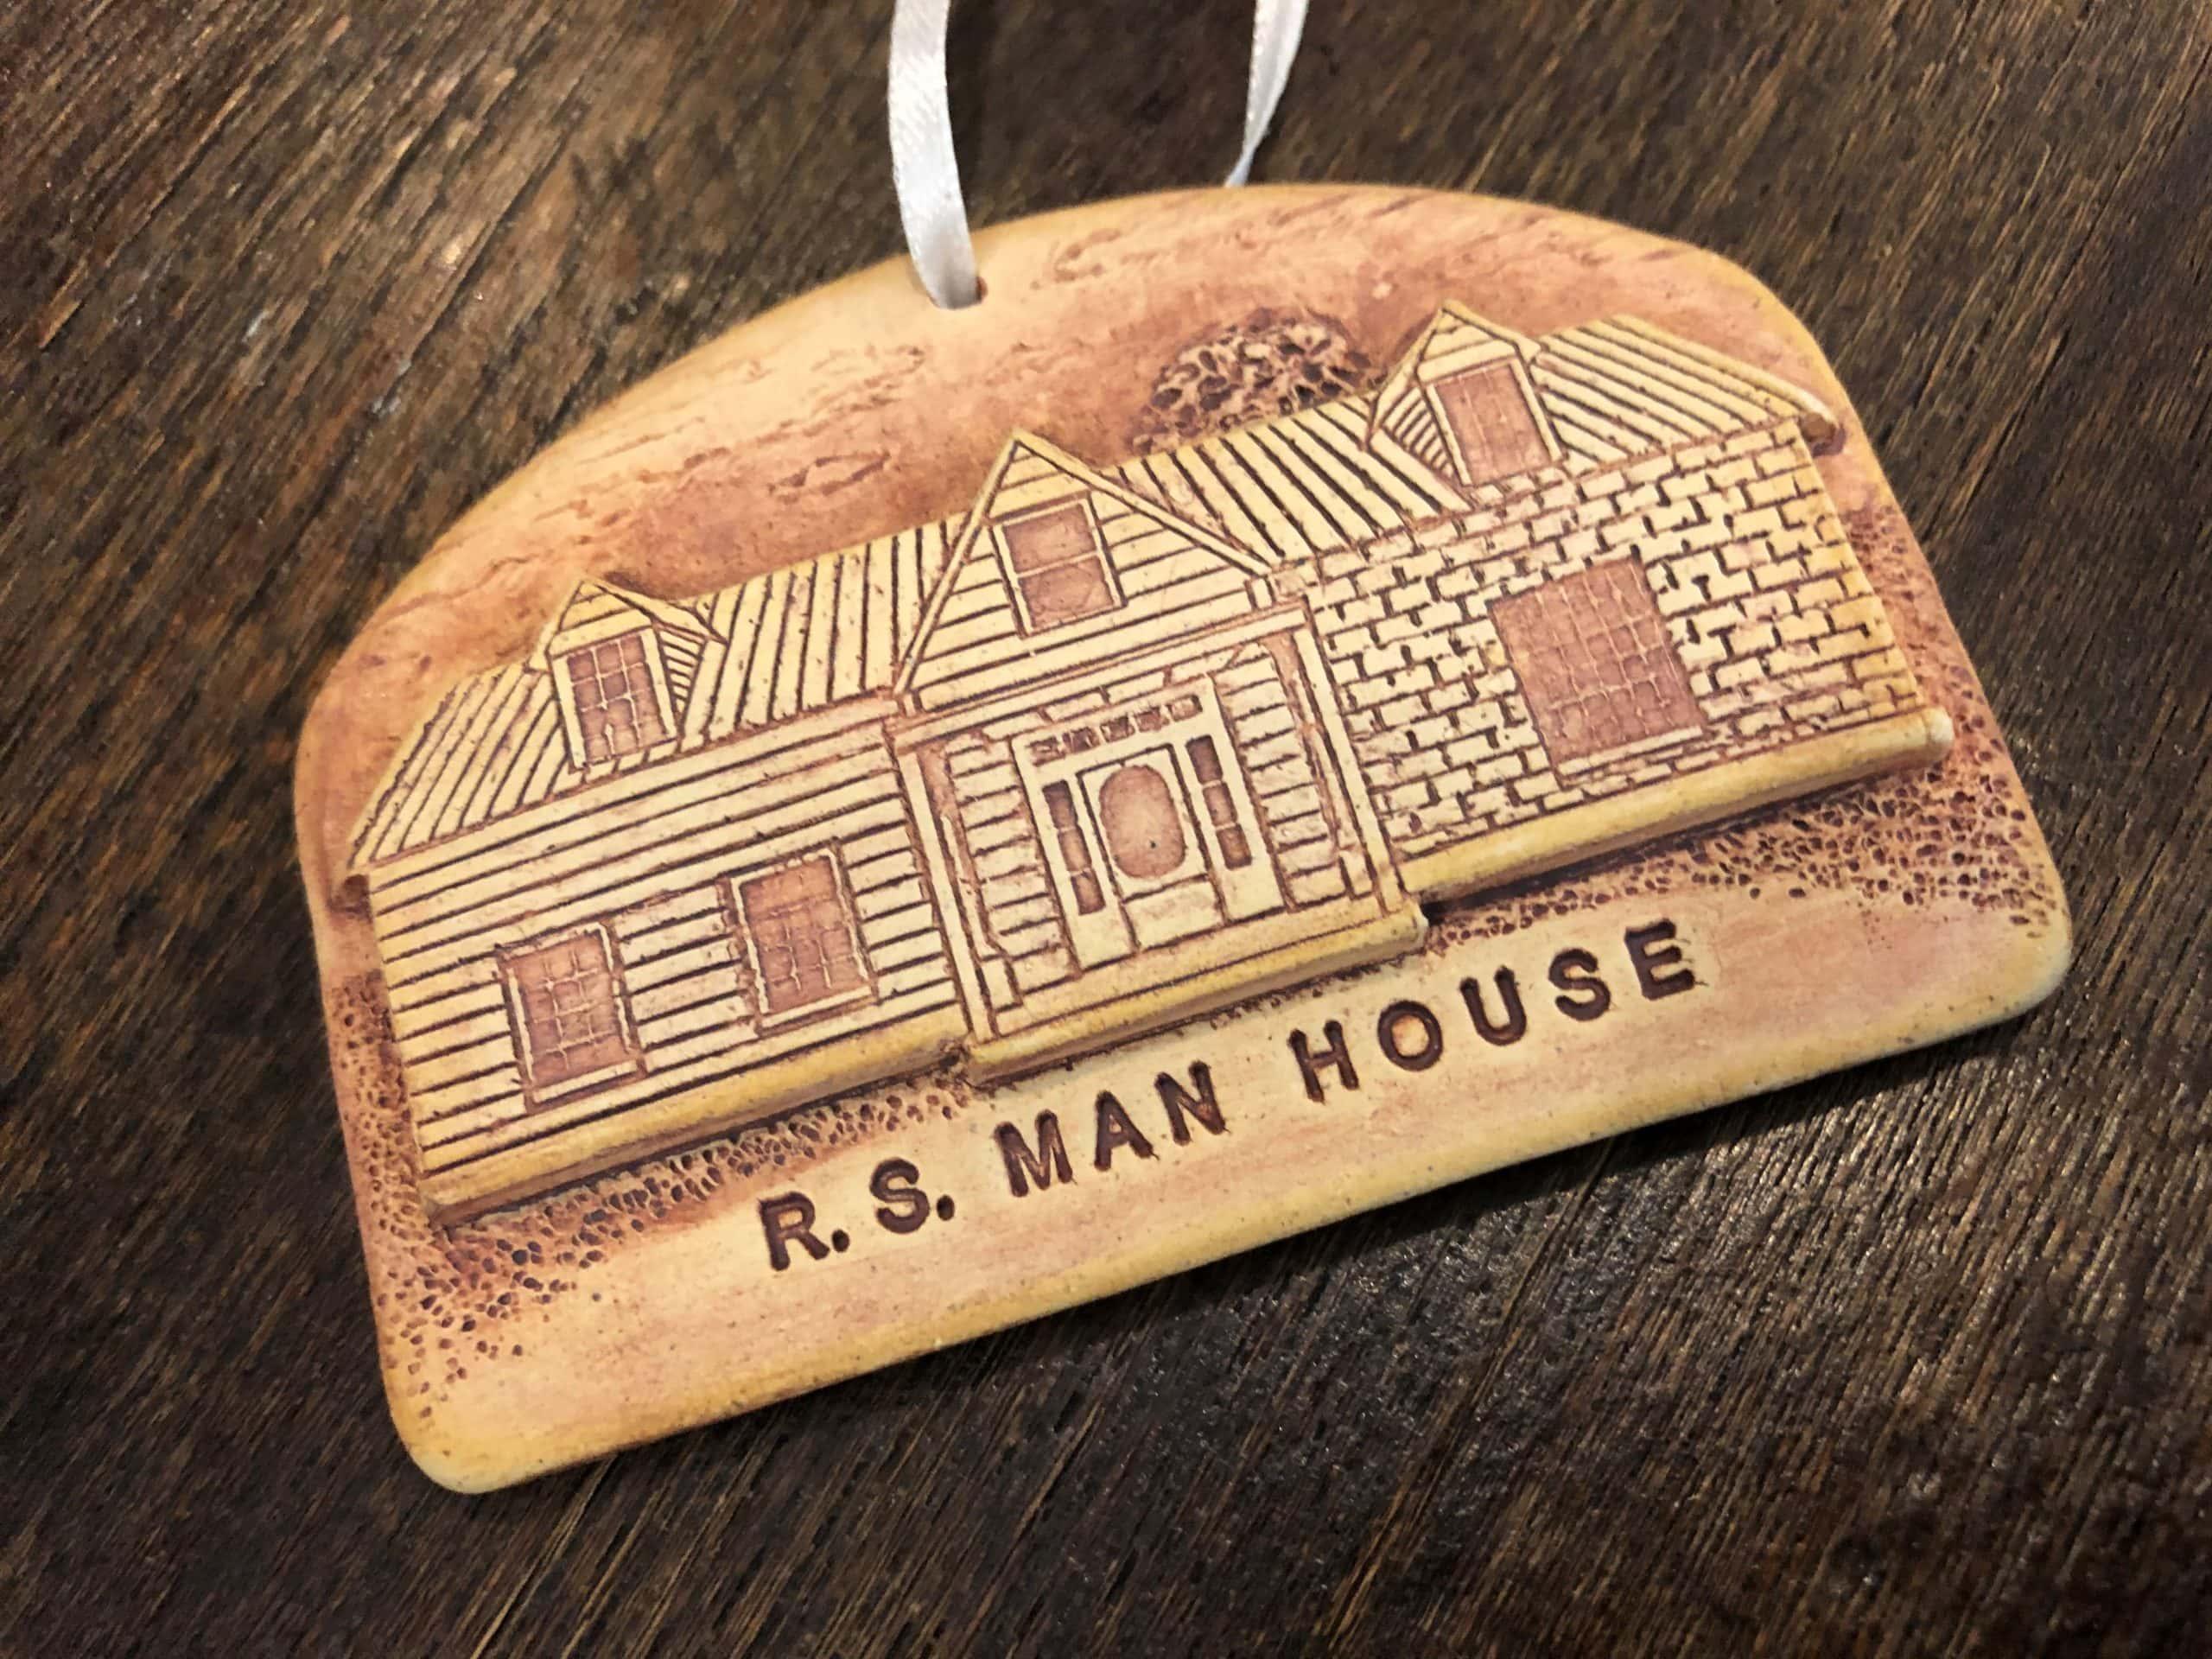 Man House ornament